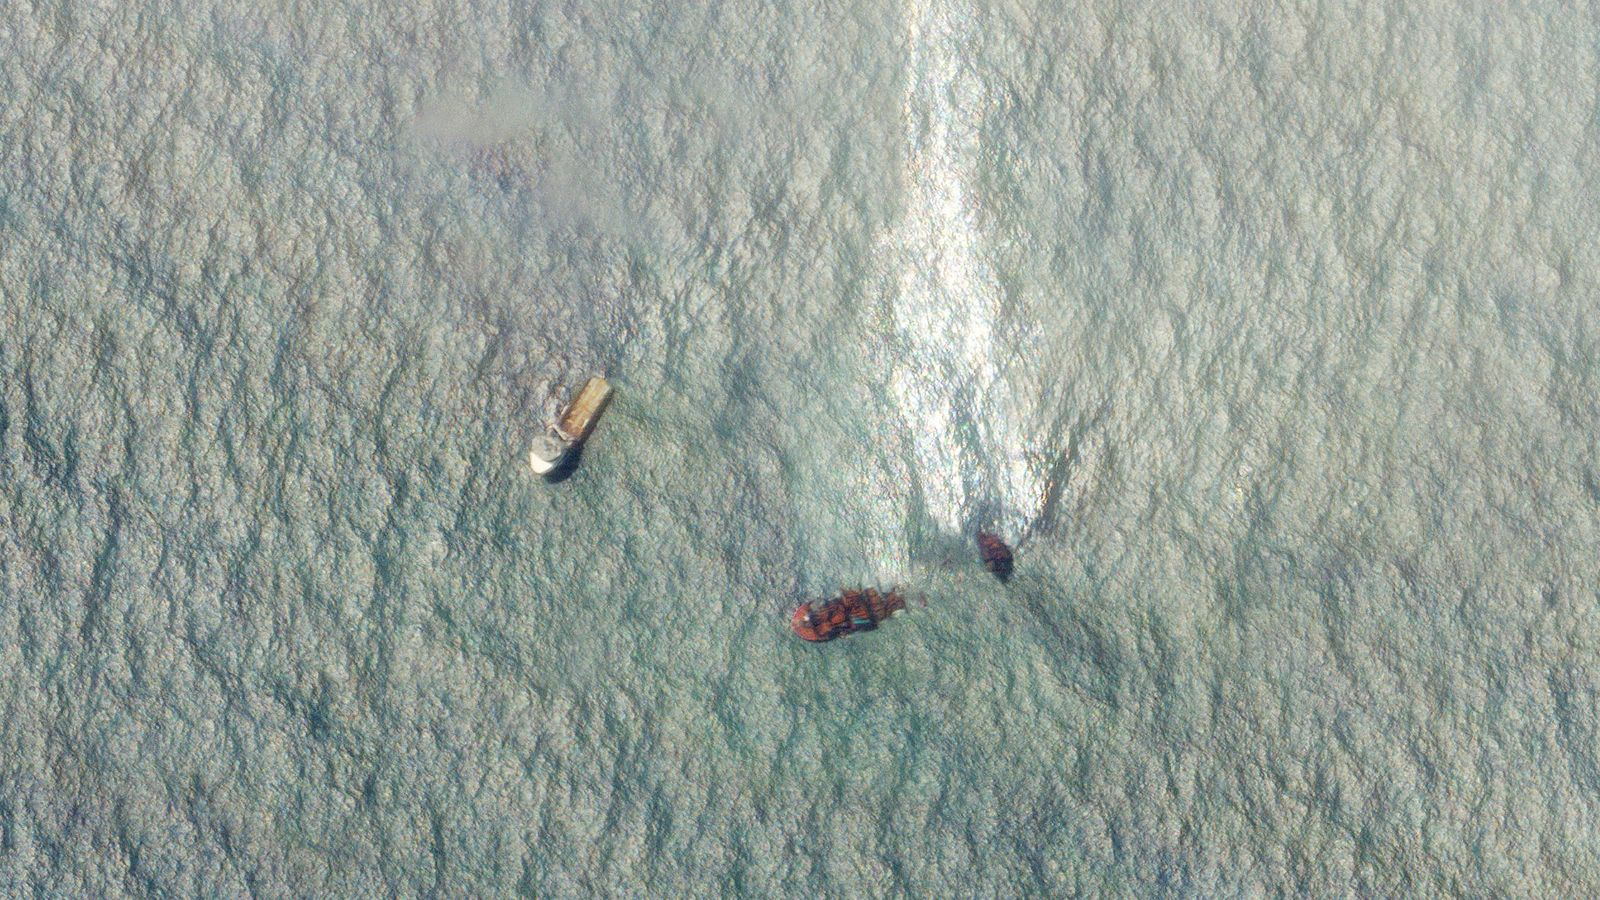 Sri Lanka cargo ship disaster: Large oil spill visible in satellite images